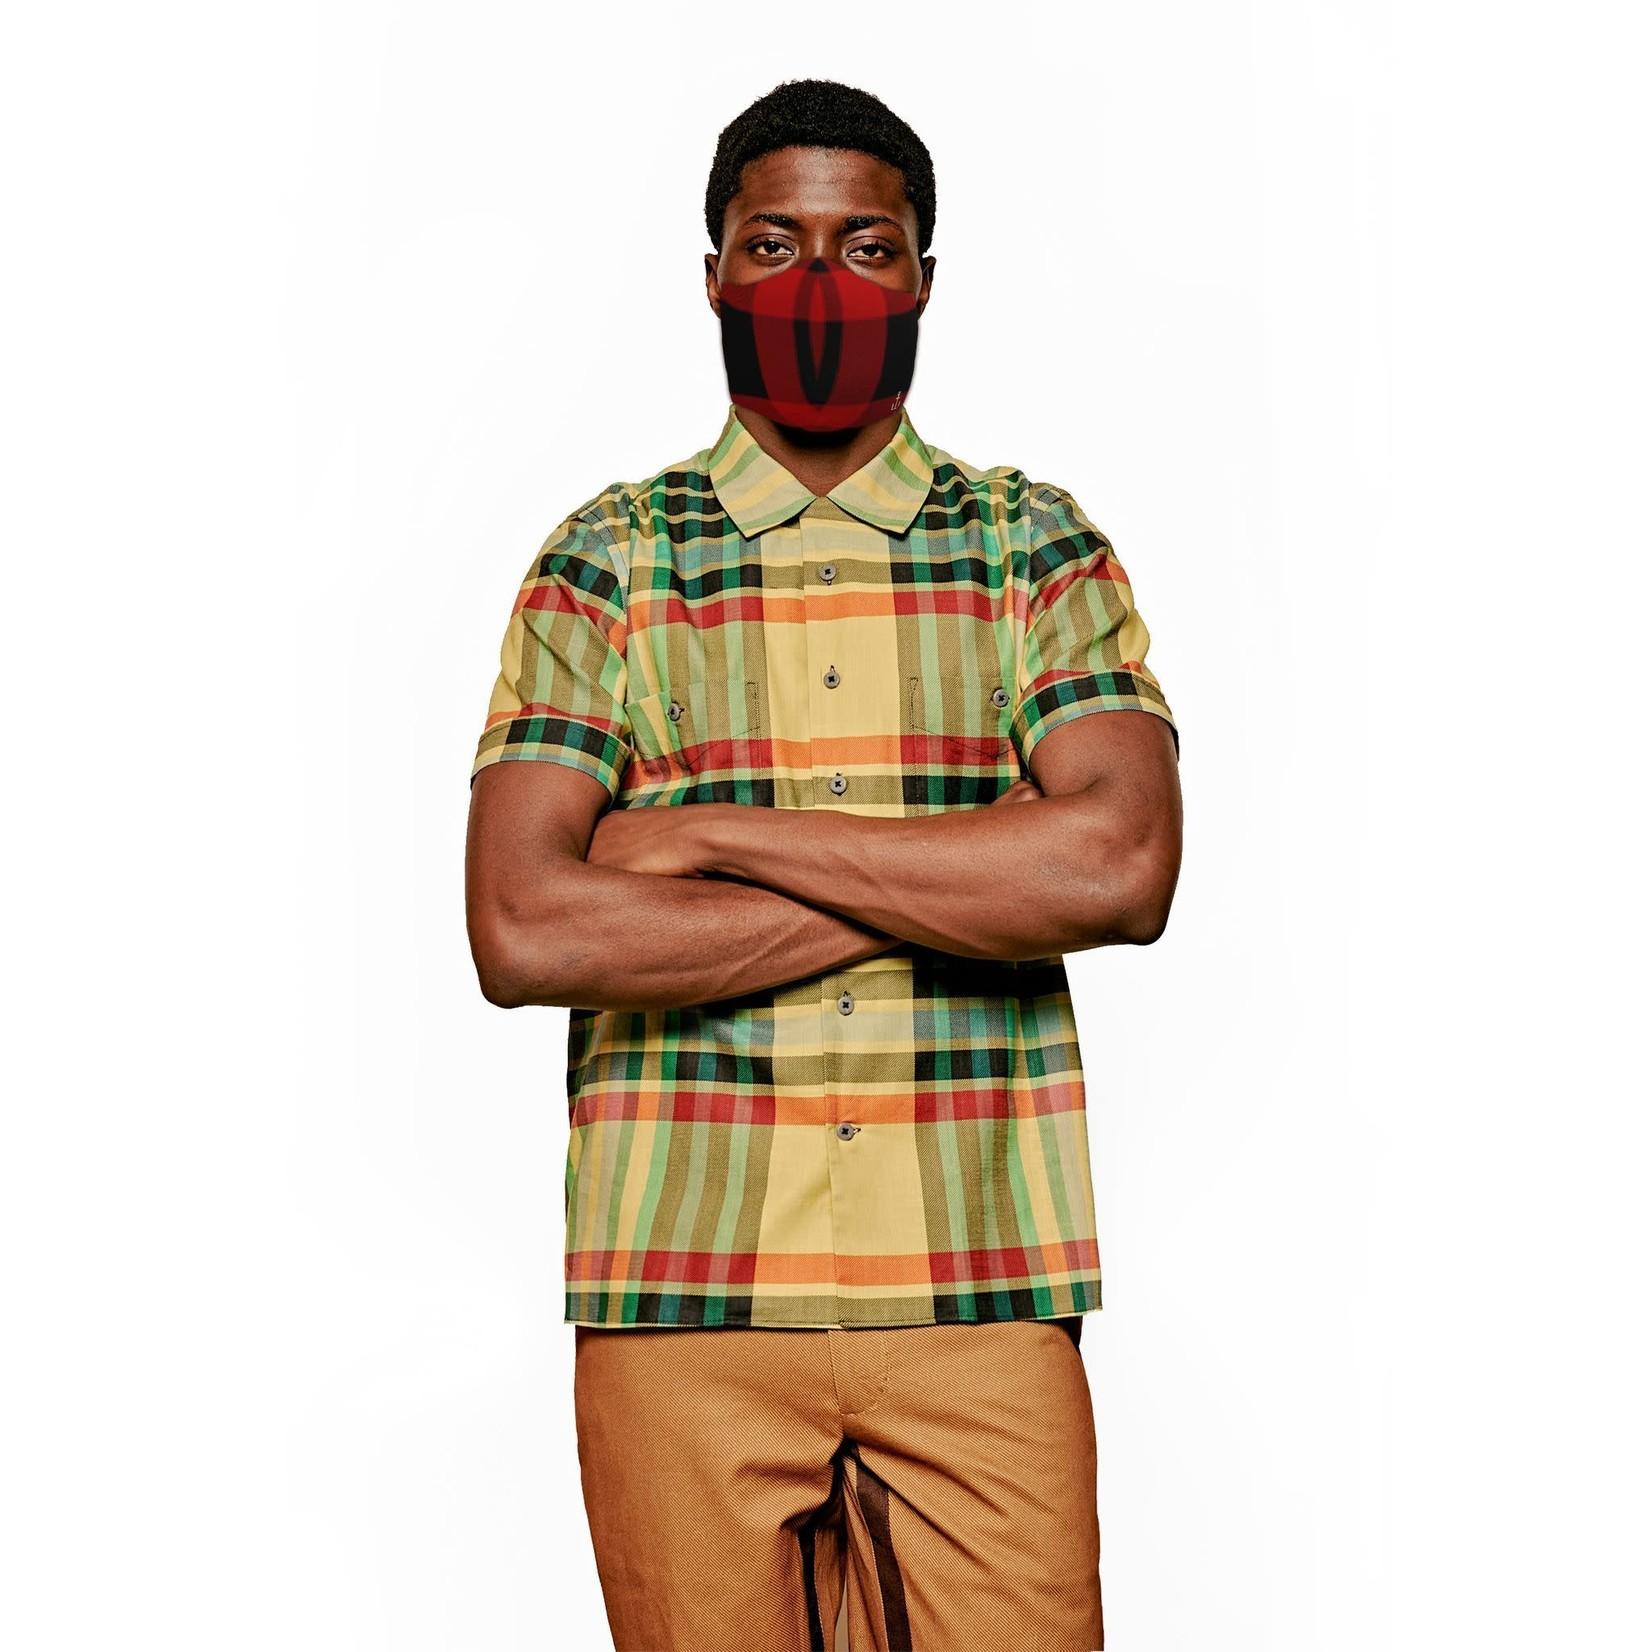 JCRT JCRT The Biggie Smalls Plaid Face Mask